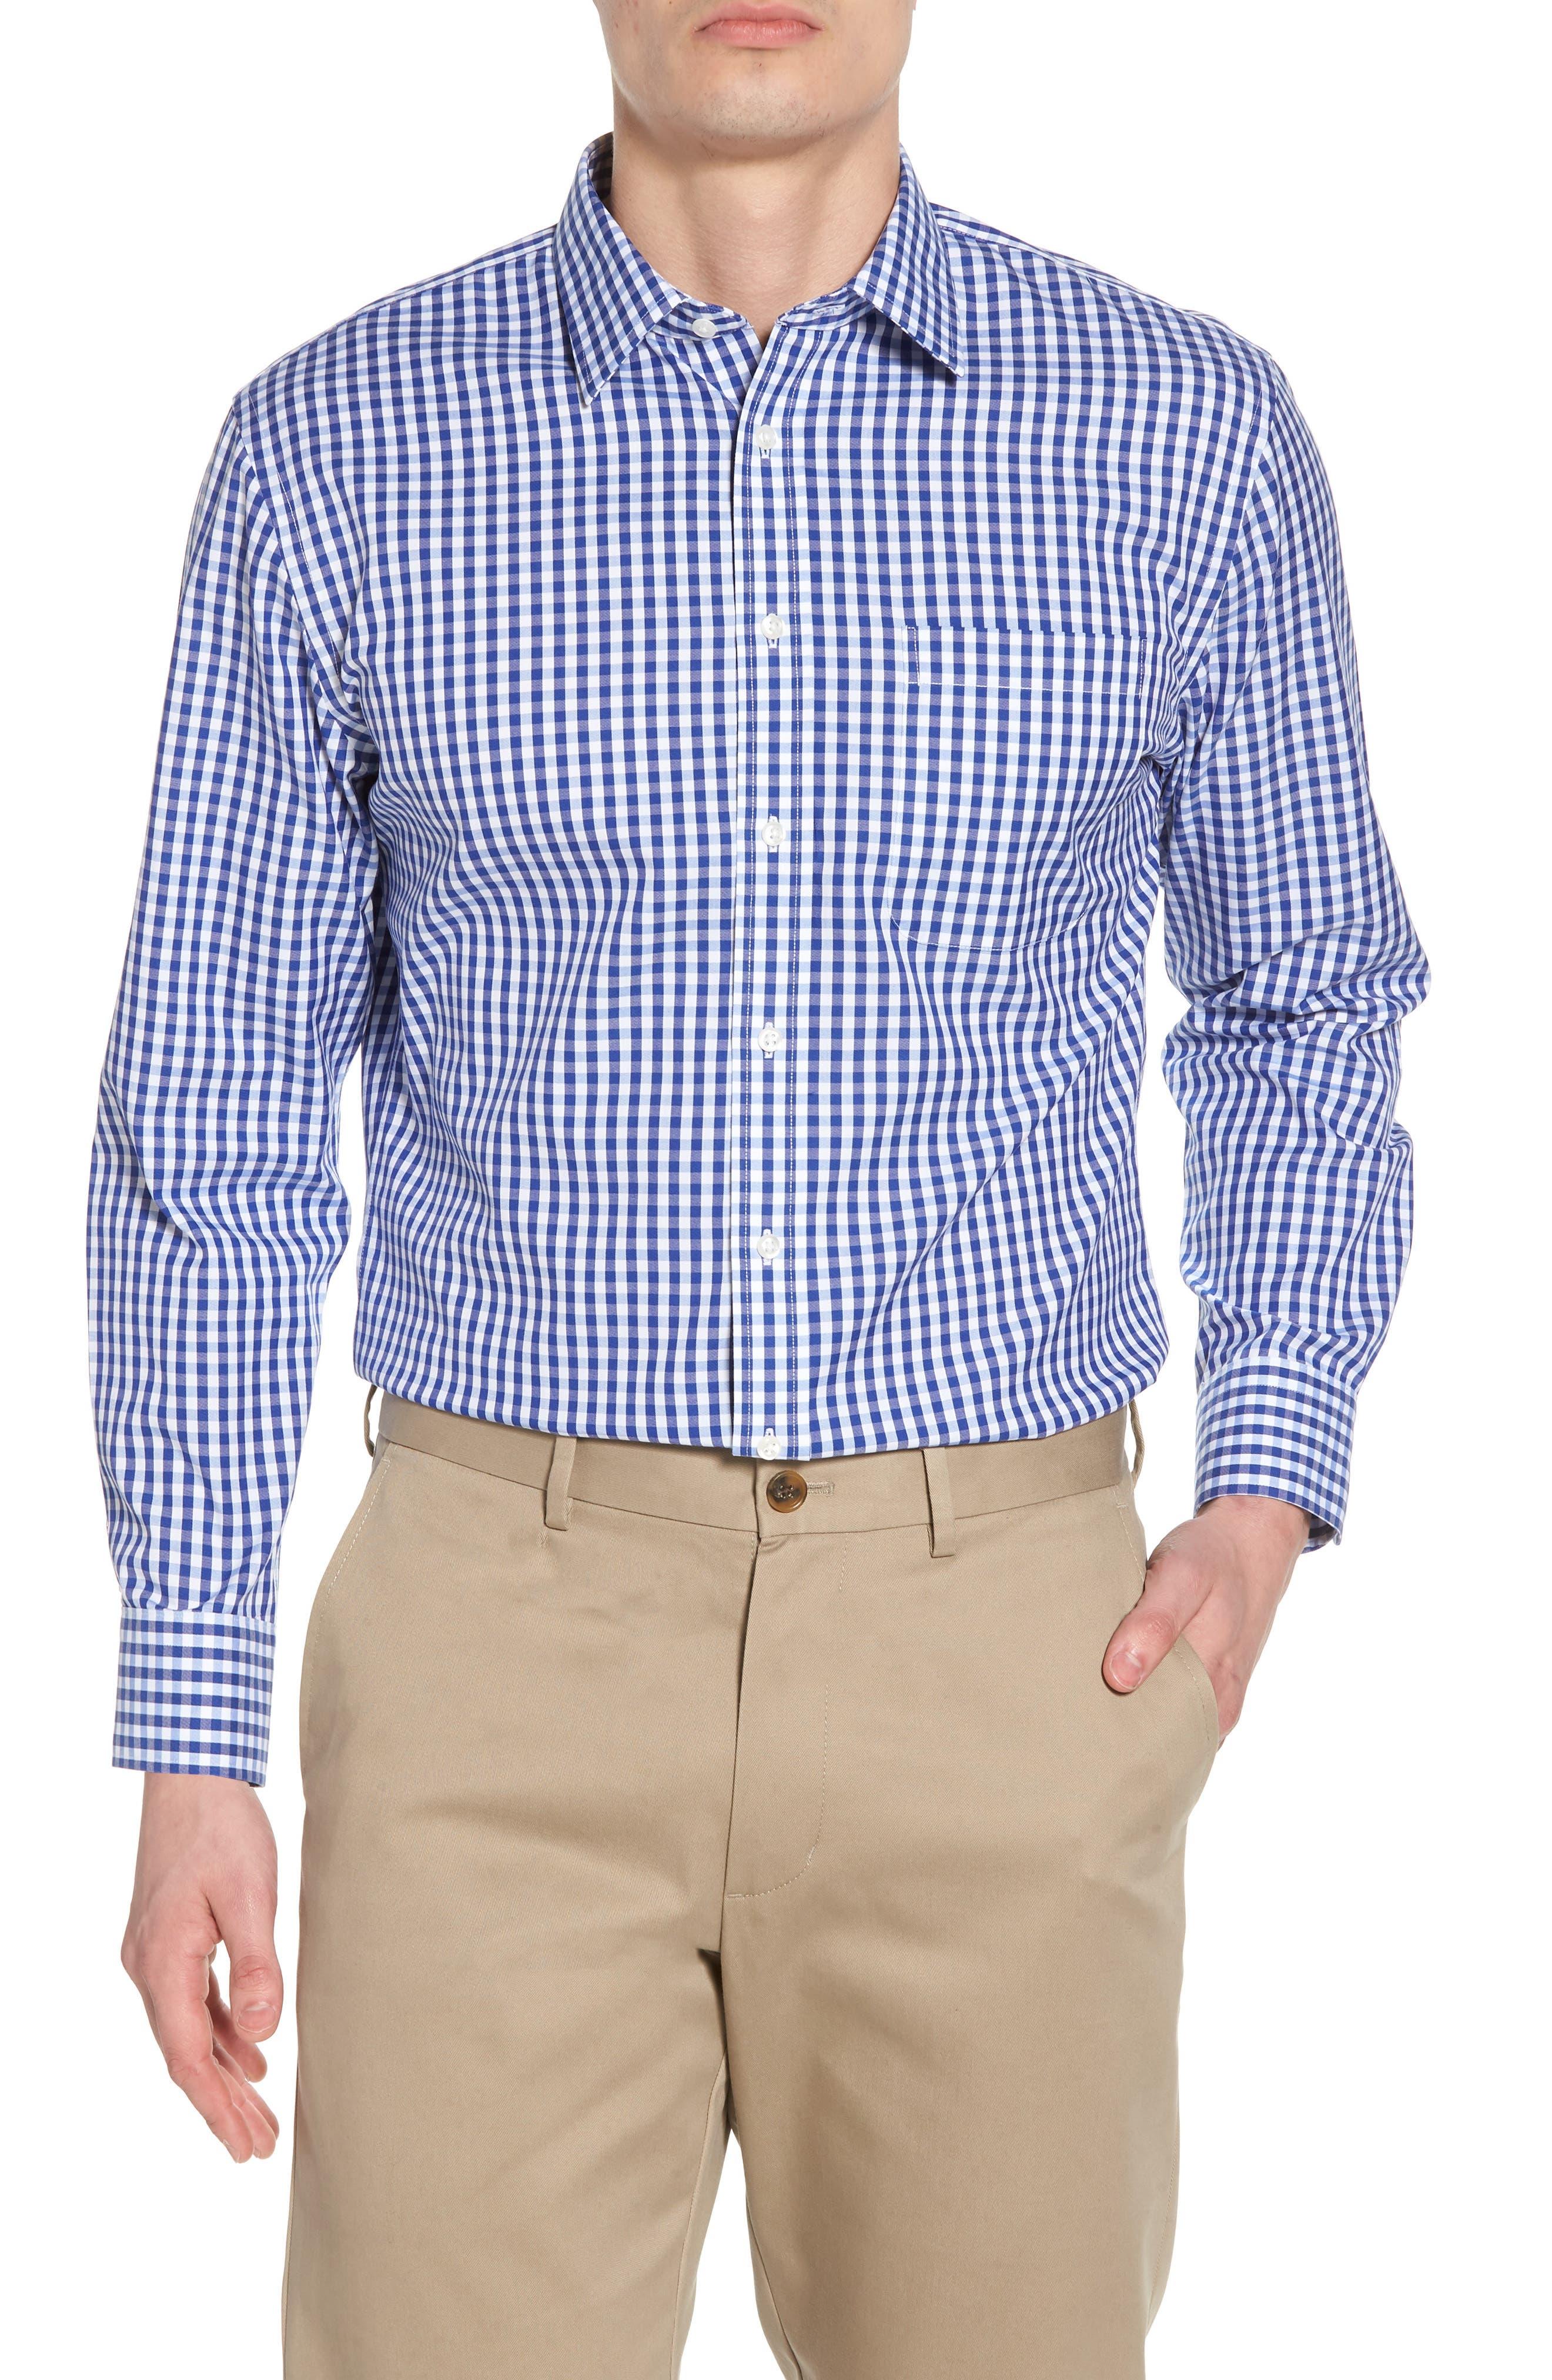 Nordstrom Menu0026#39;s Shop Smartcareu2122 Trim Fit Check Dress Shirt | Nordstrom